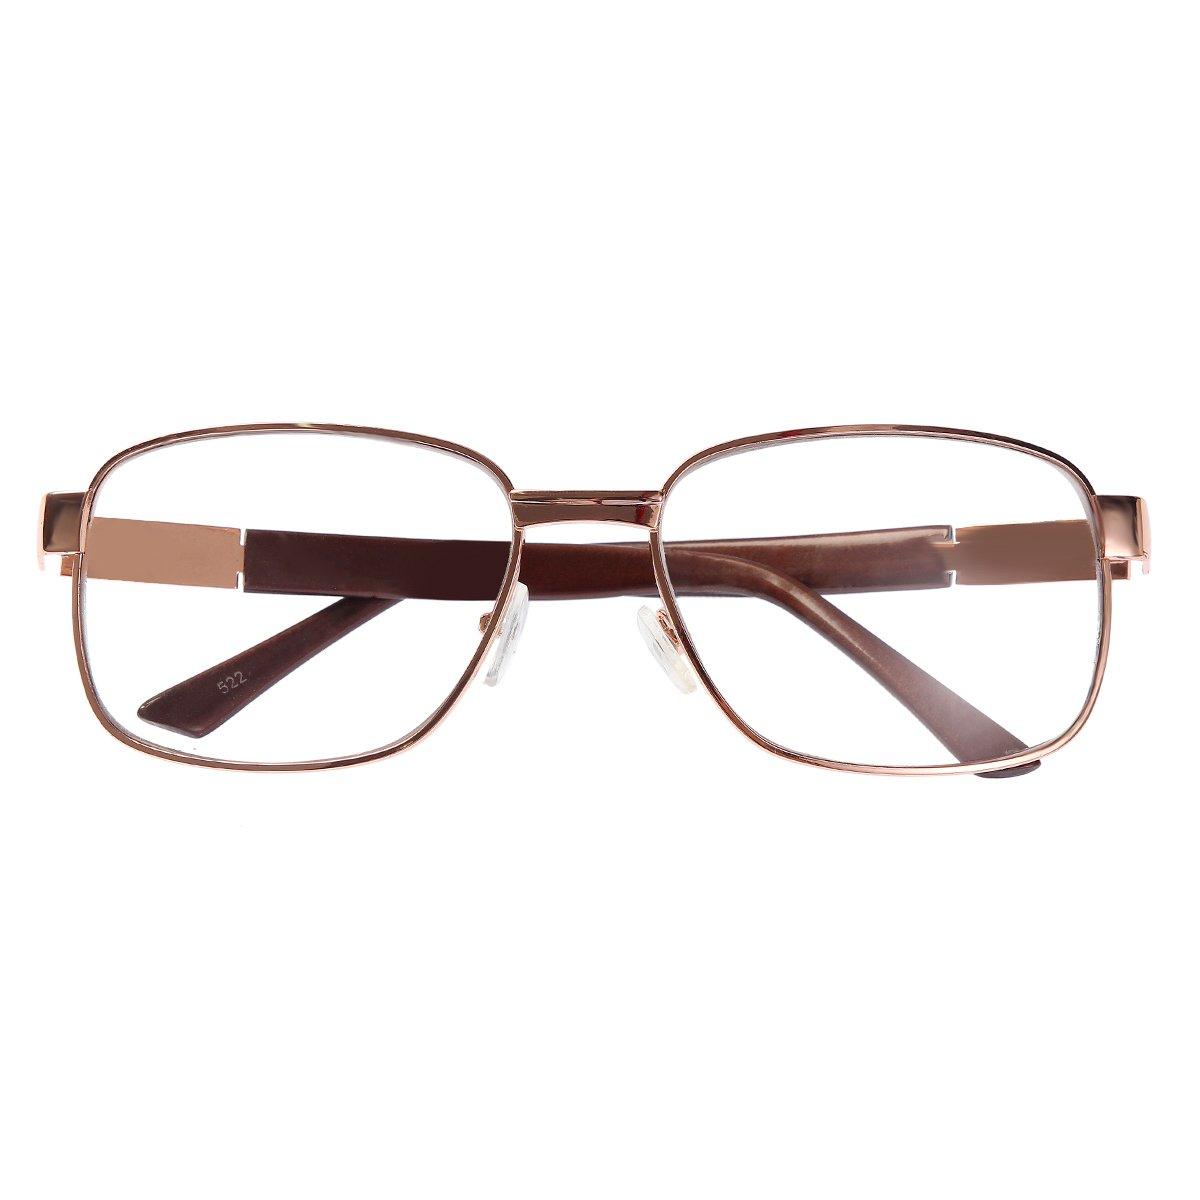 Southern Seas Classic Stylish Mens Womens Photochromic Brown or Grey Sunglasses